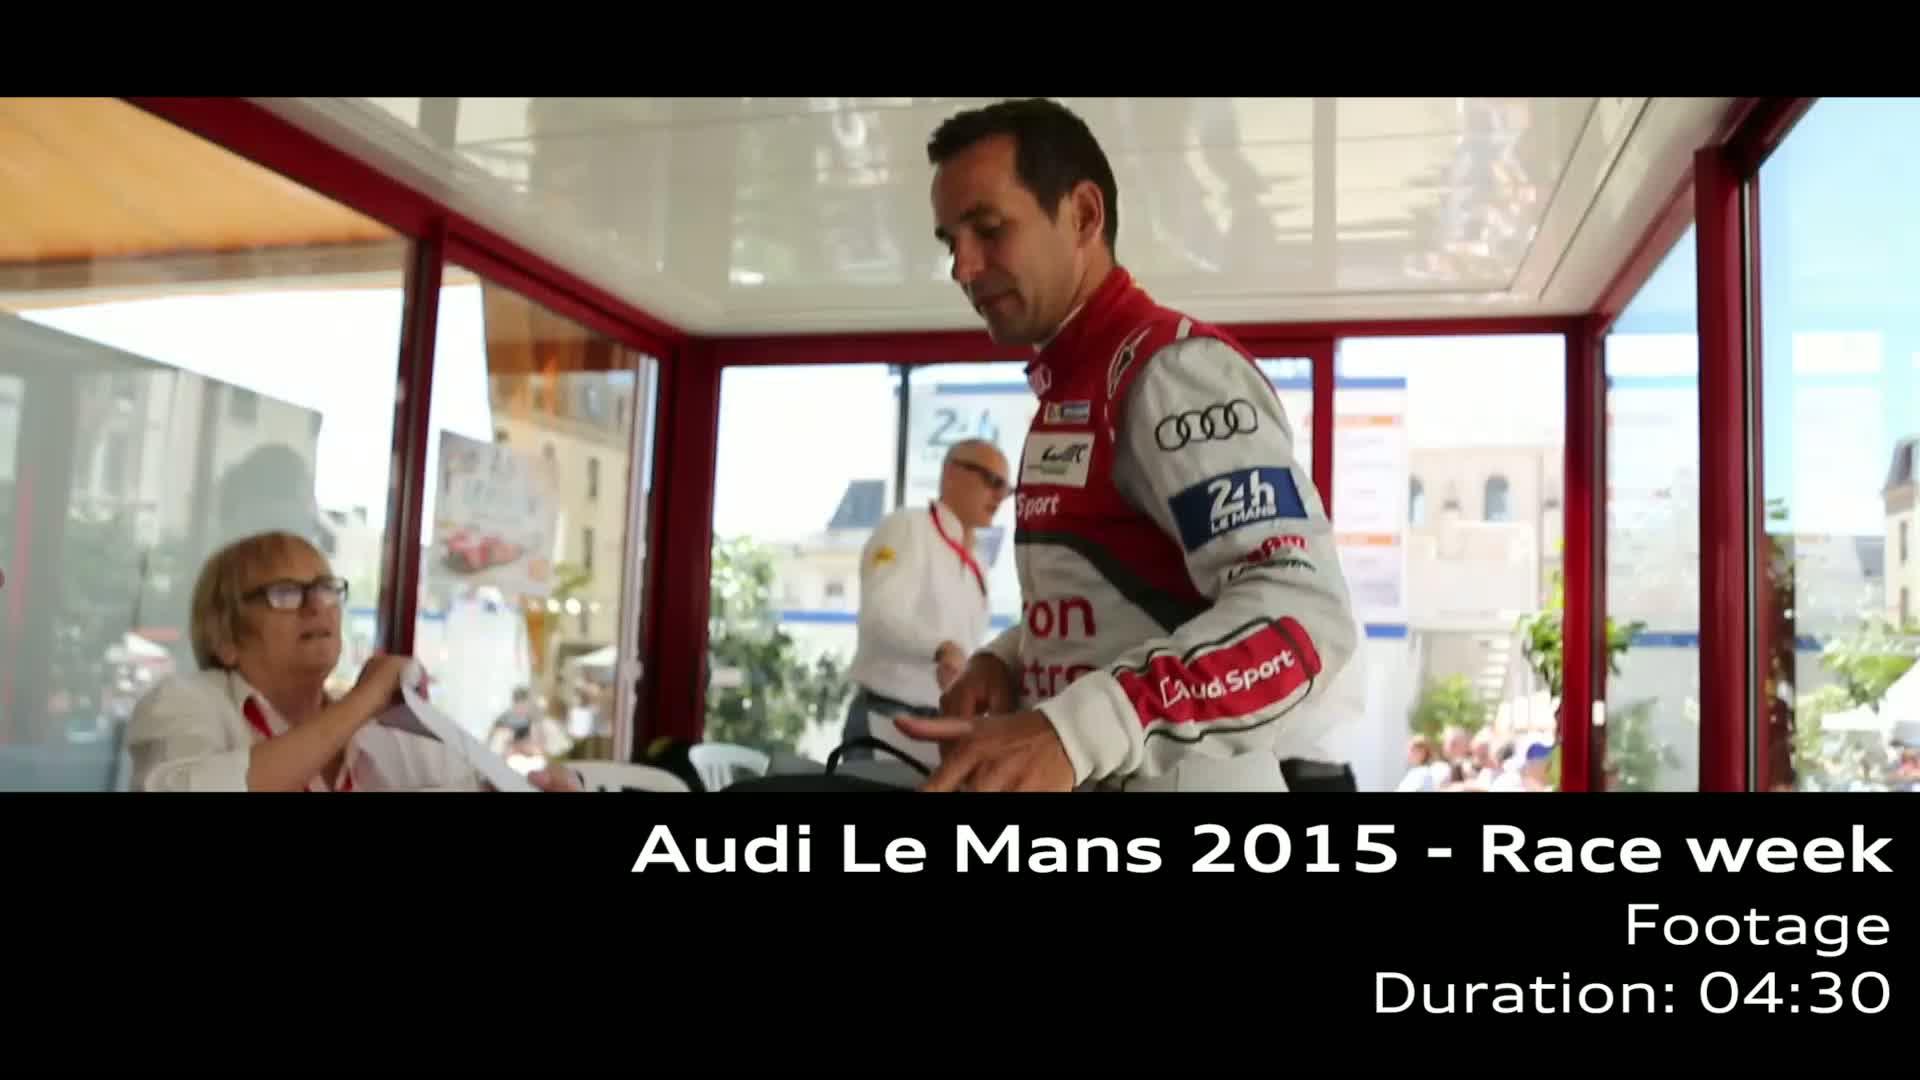 Le Mans 2015 - Footage Raceweek